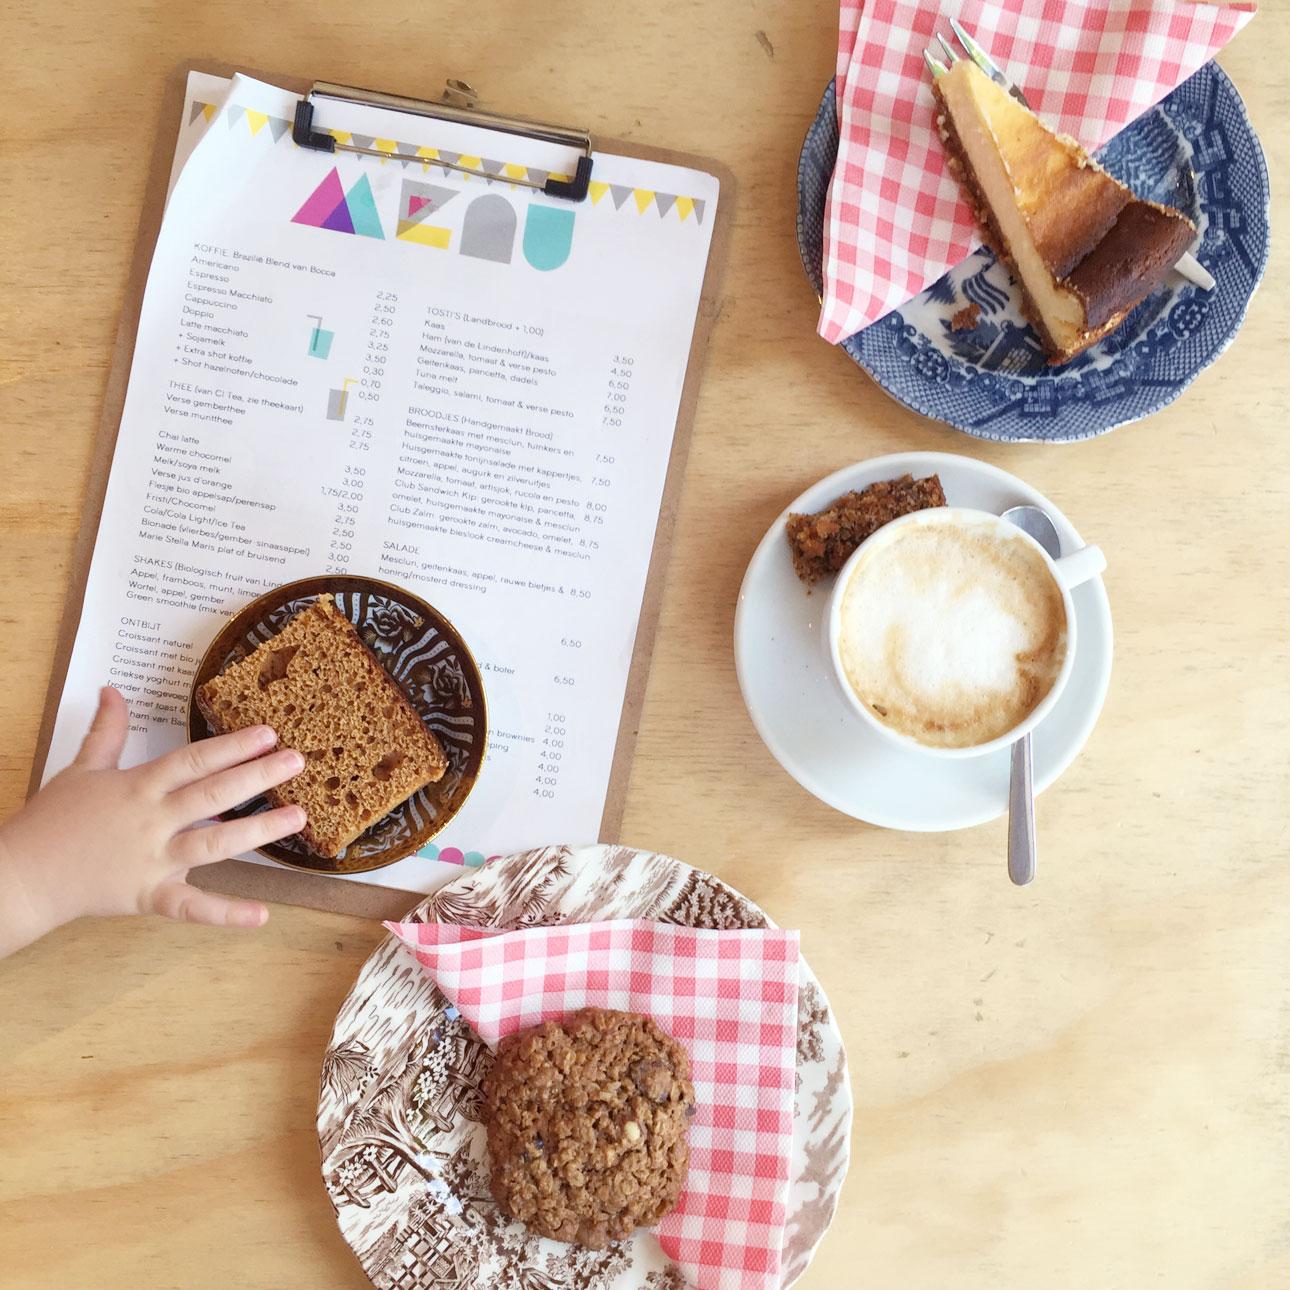 Dagje Amsterdam met kids Minimarkt menu